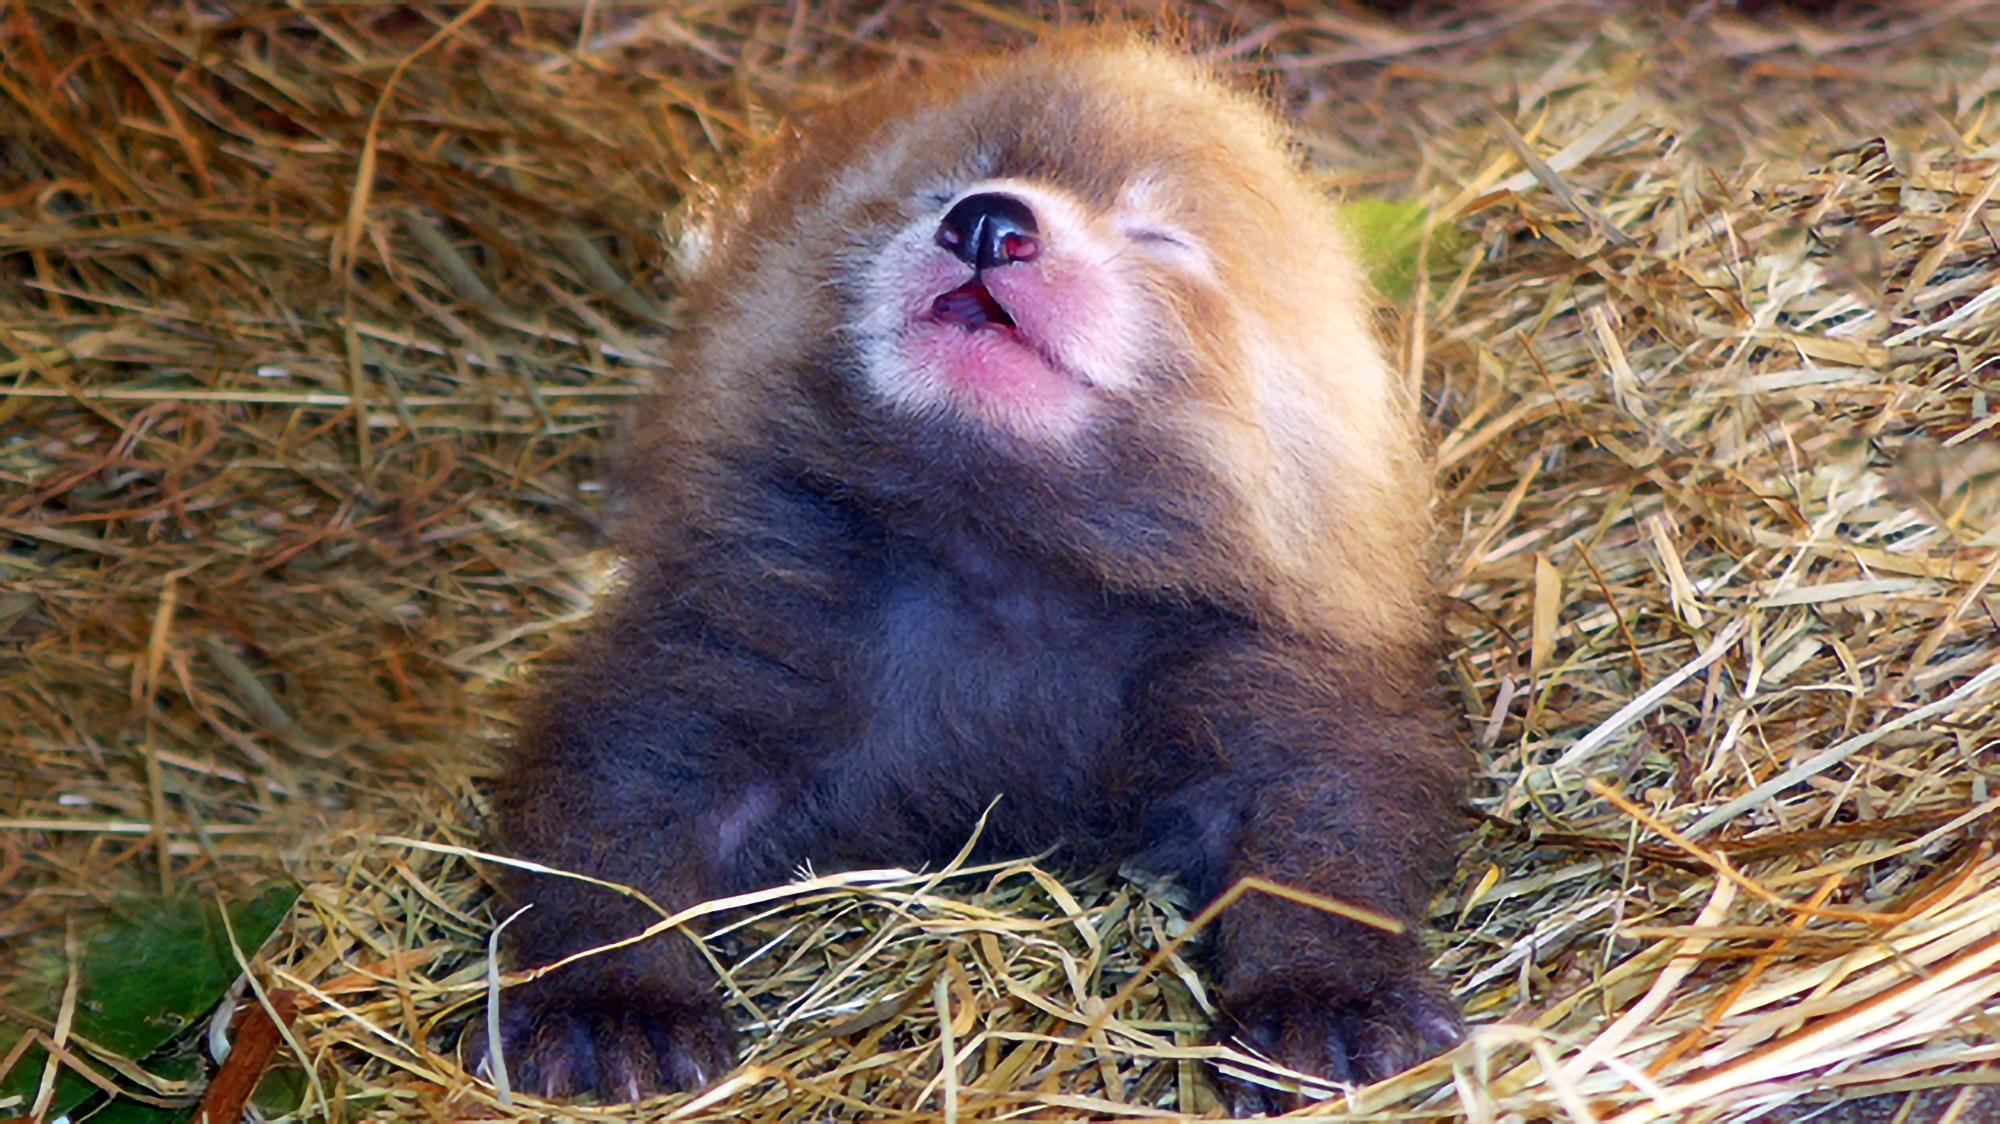 Rare red panda born at Dutch zoo